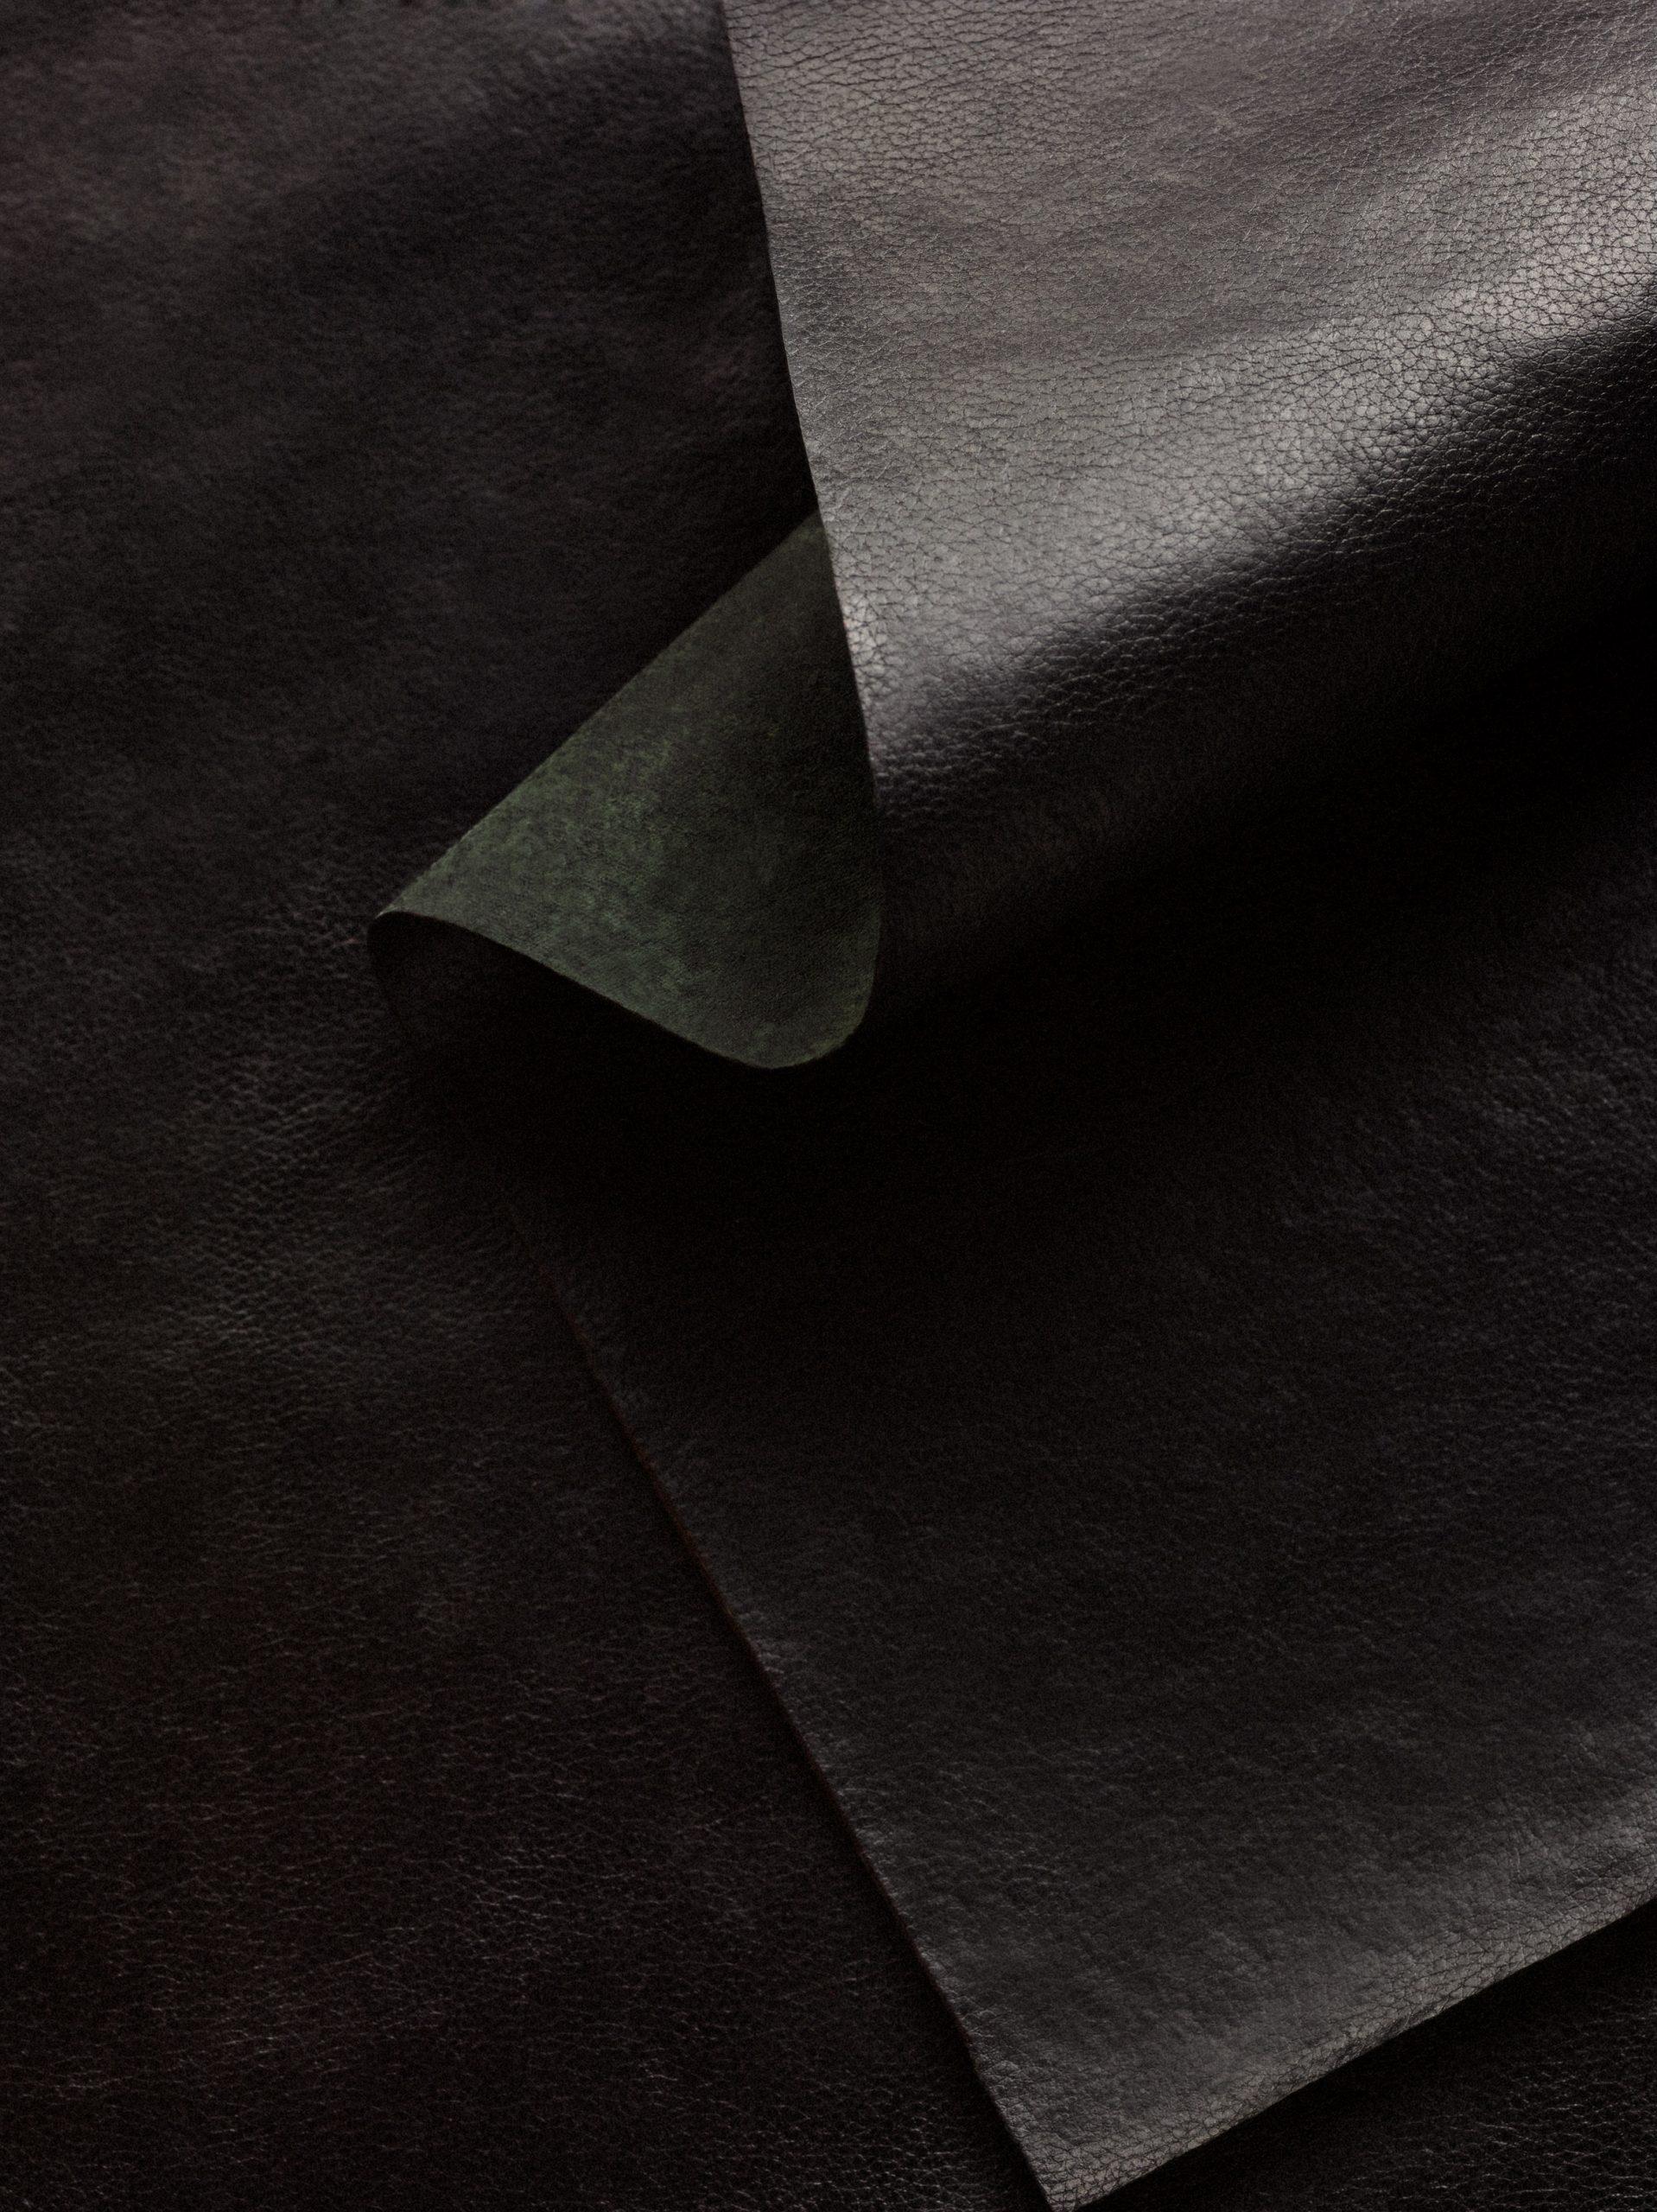 Reishi mycelium leather in black